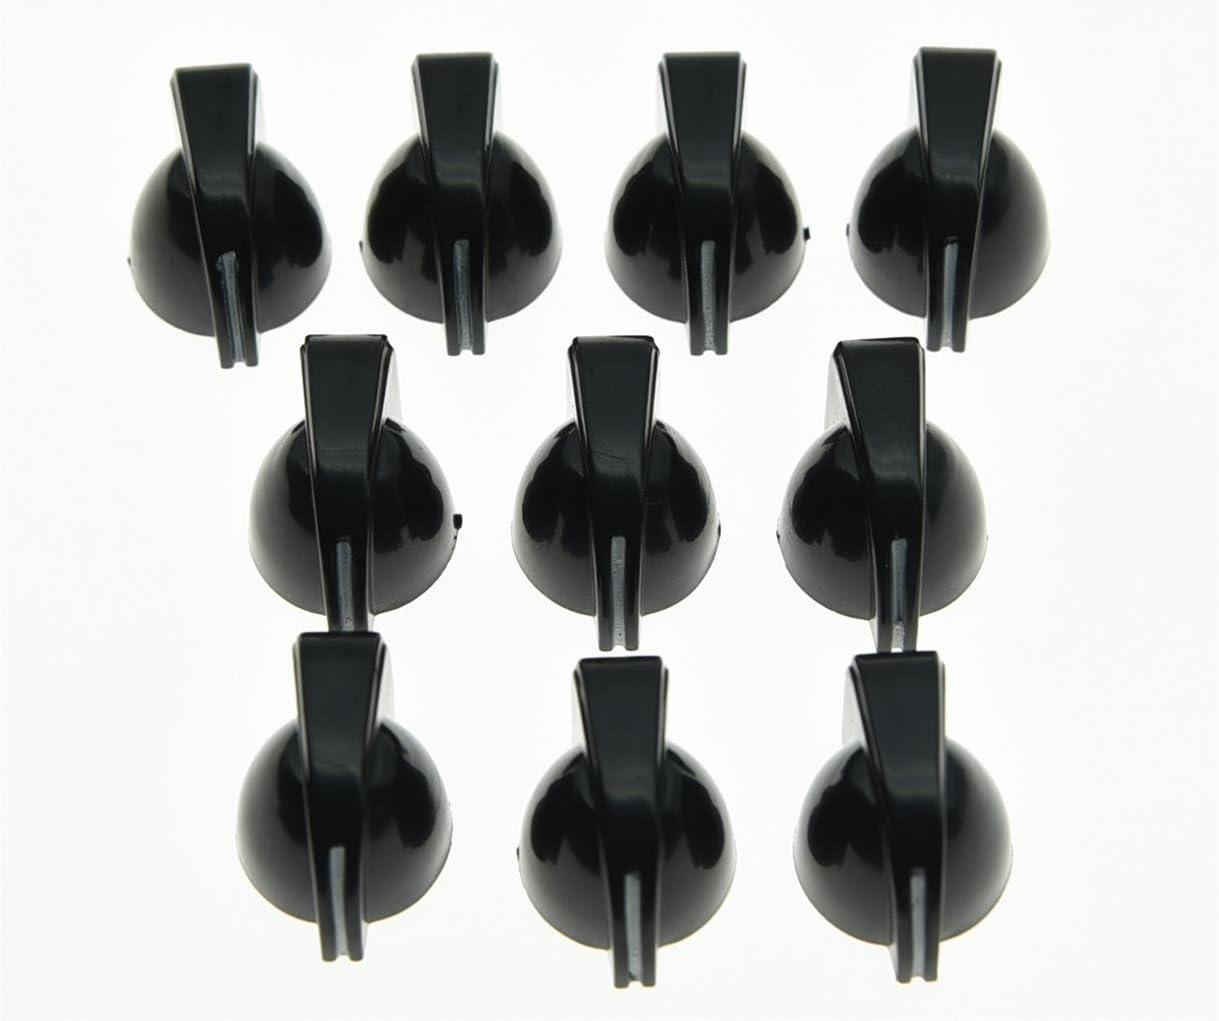 KAISH 20x San Diego Mall Mini Chicken Head Knobs AMP Safety and trust Guitar Amplifier Effe Knob